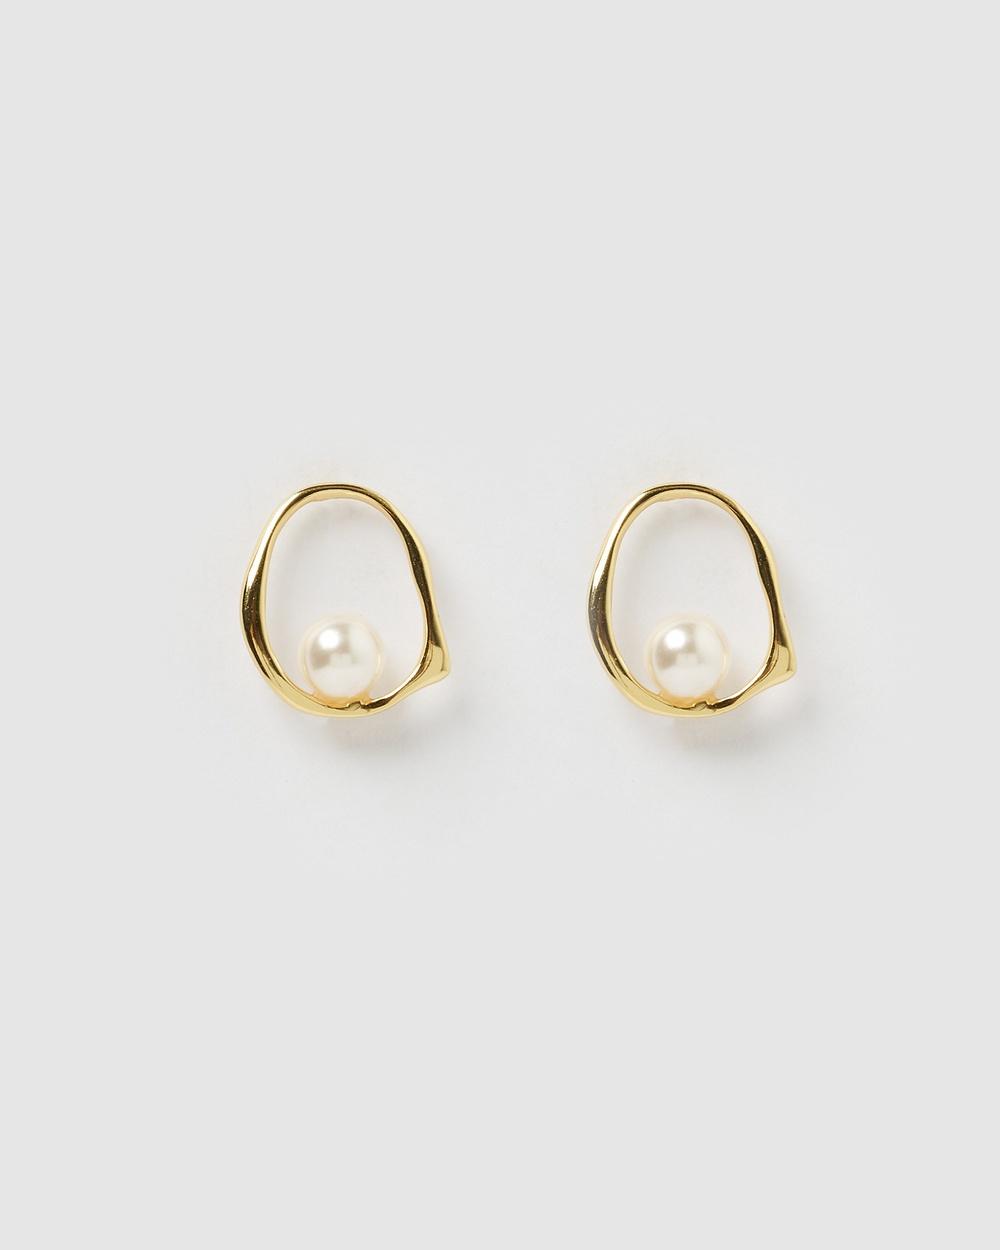 Izoa Jade Freshwater Pearl Earrings Jewellery Gold Pearl